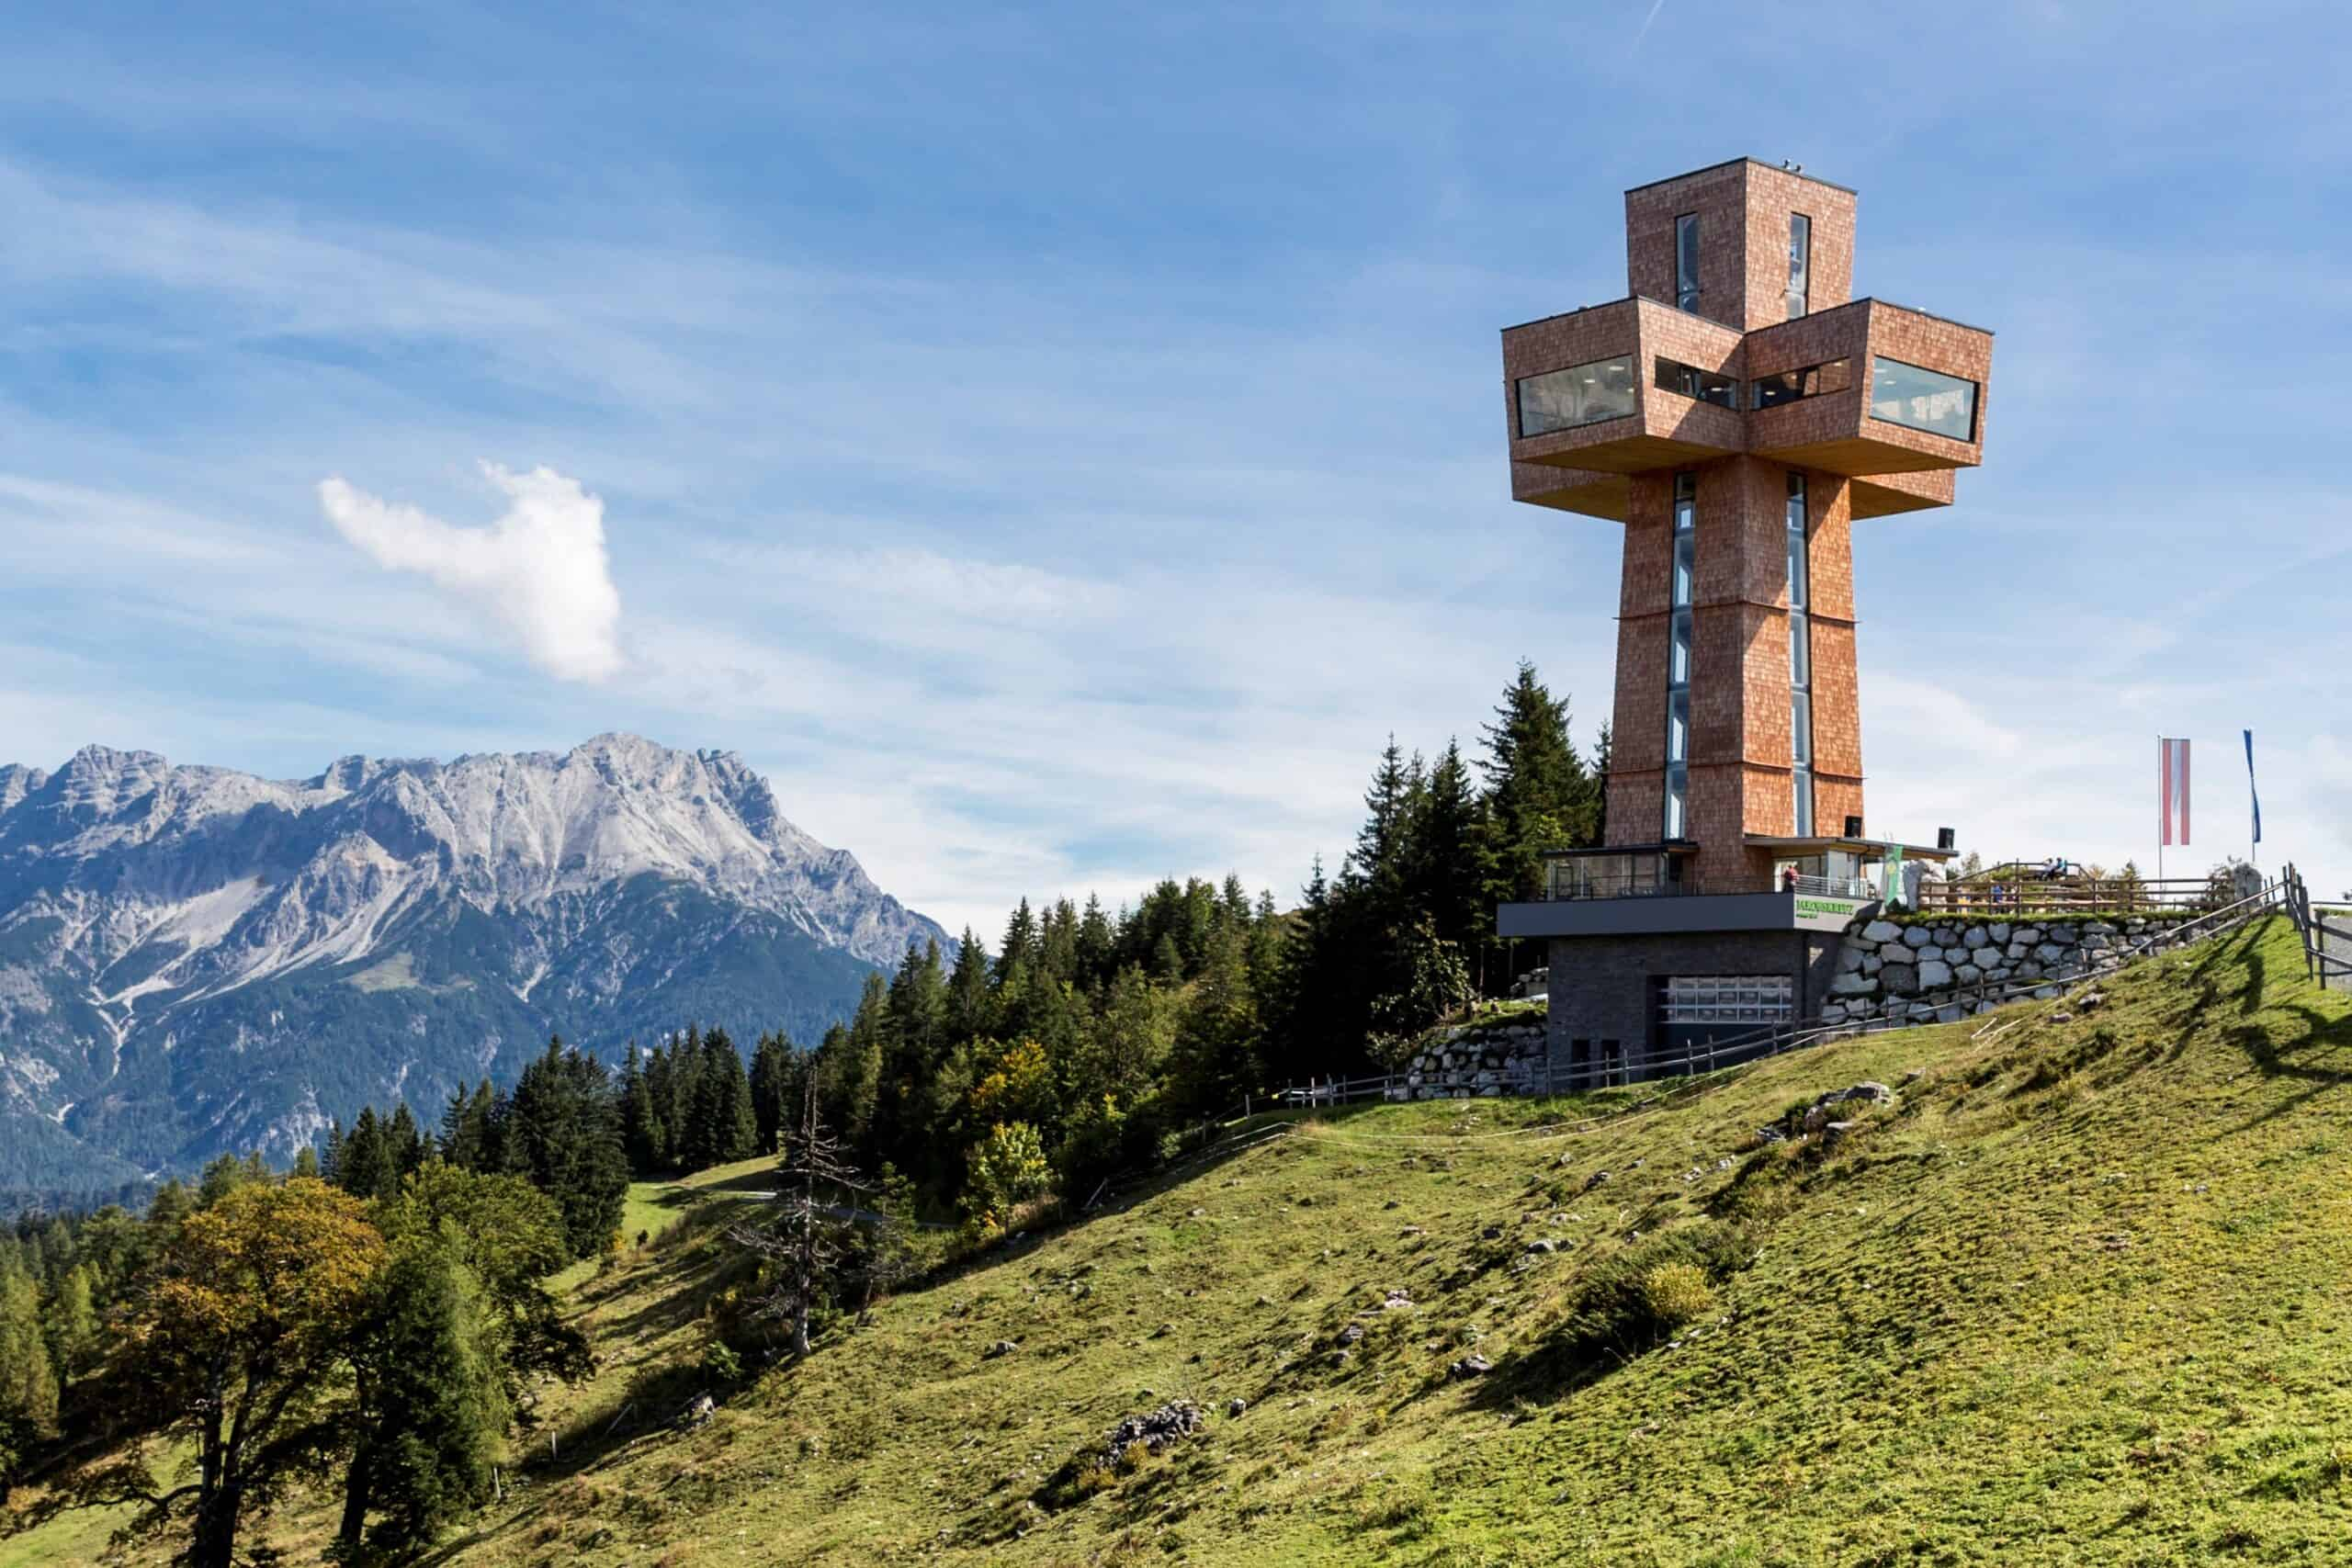 Alpenland – Auf den Spuren des Bergdoktors